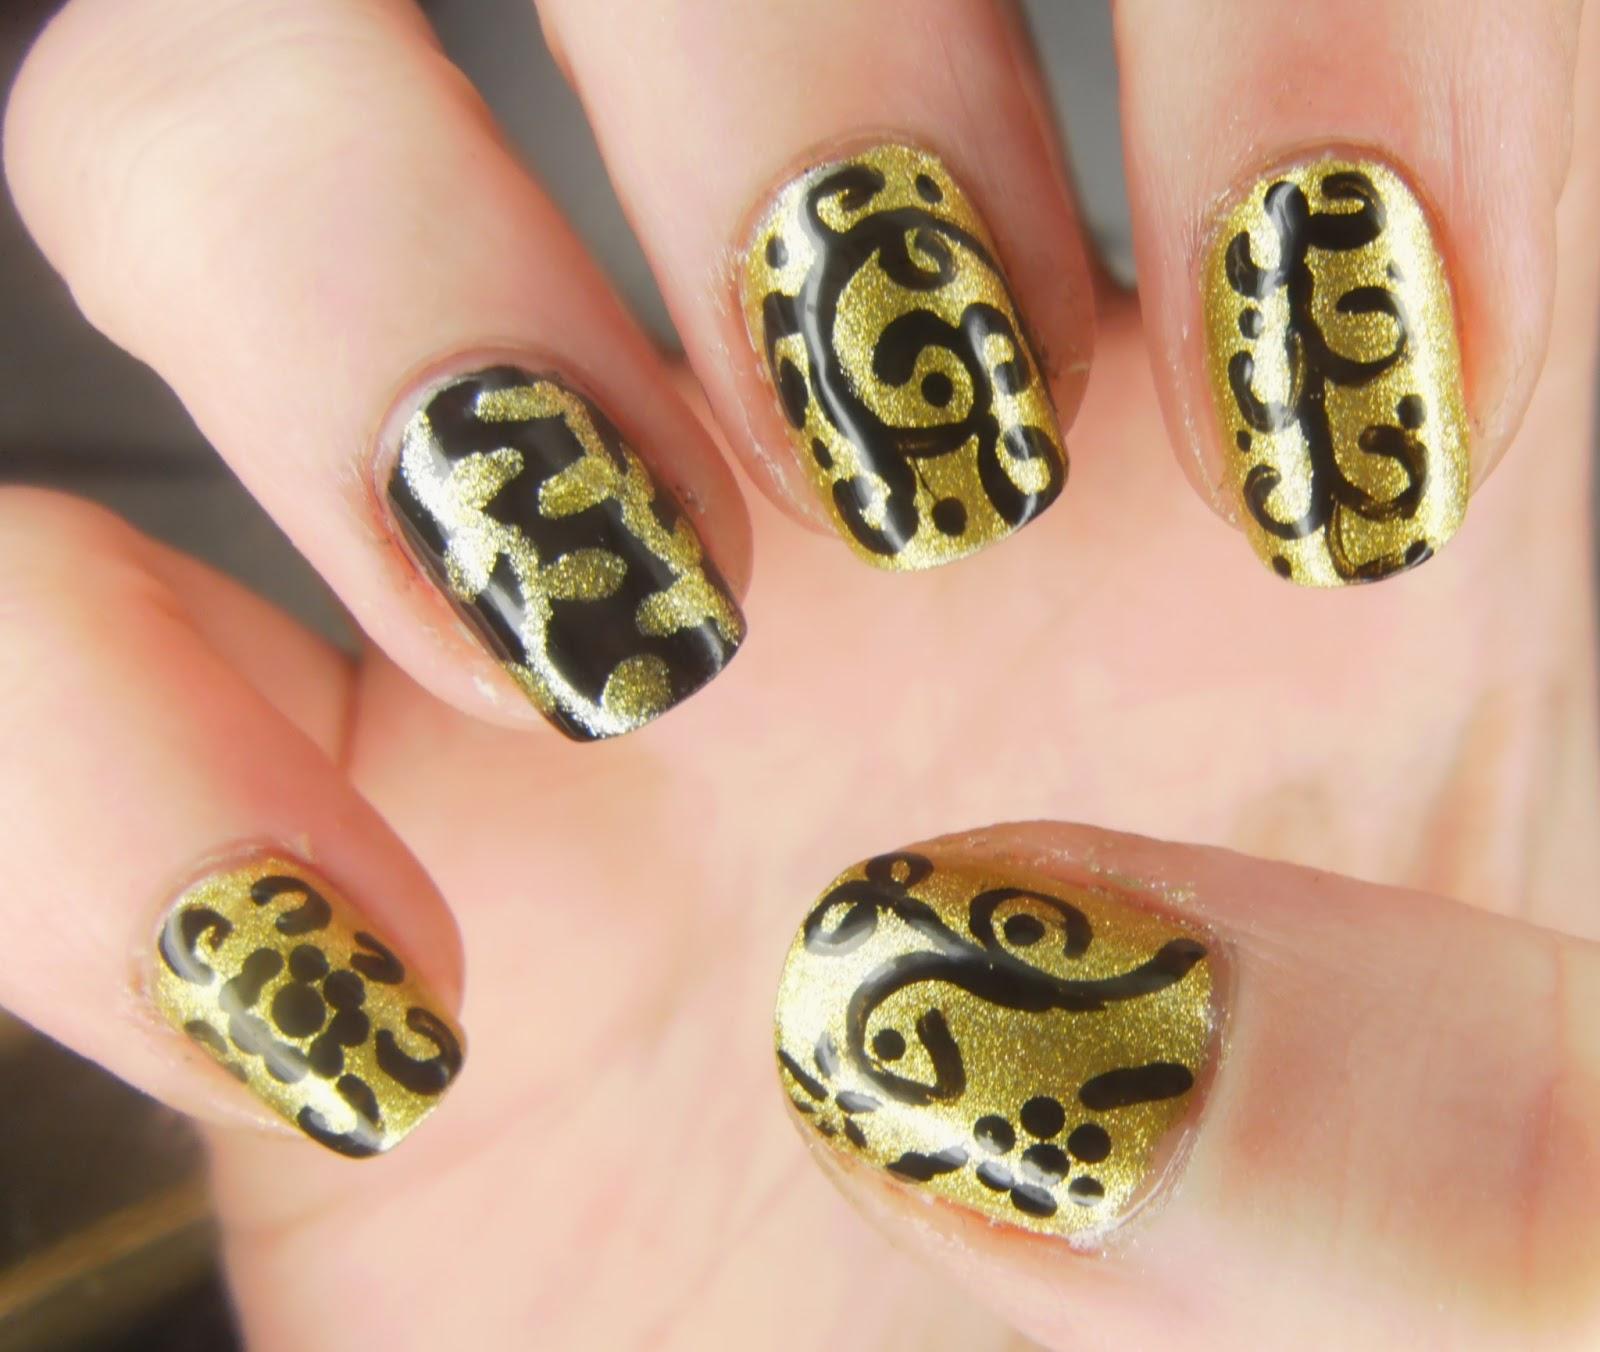 SpecialGirl Nails: Models Own Black Nail Art Pen And Gold